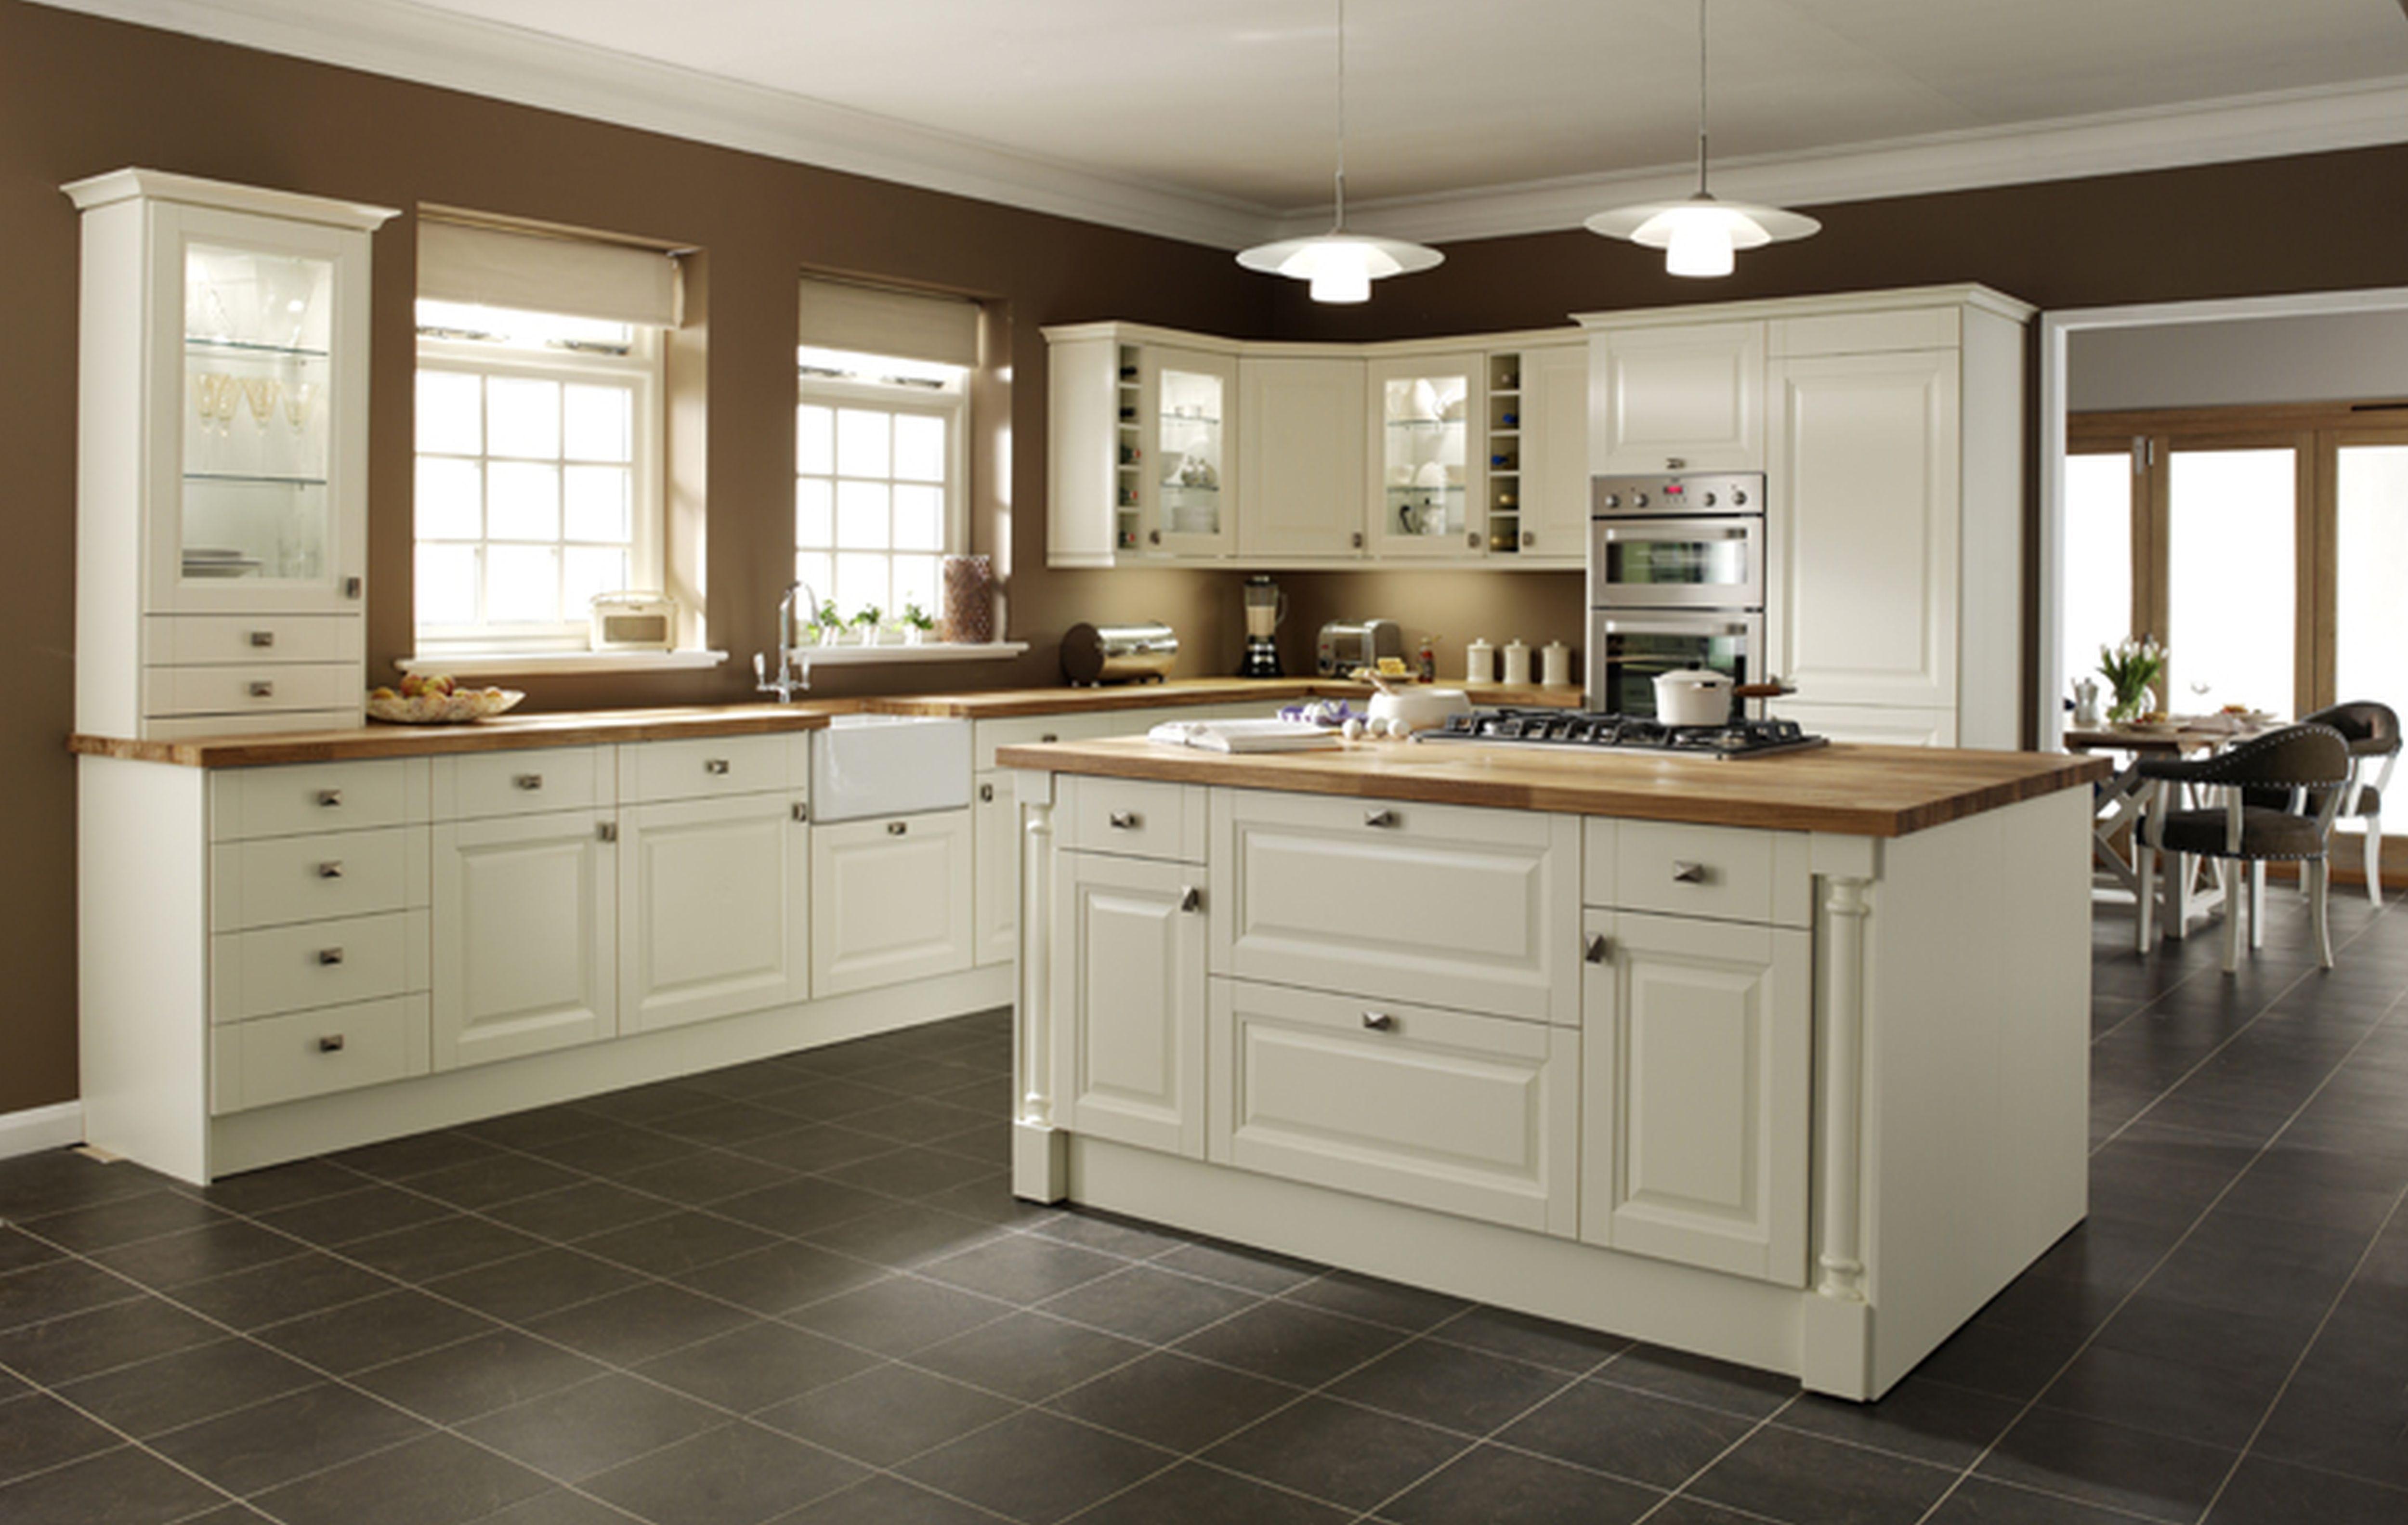 KitchenAwesome Interior Gray Square Tile Kitchen Floor